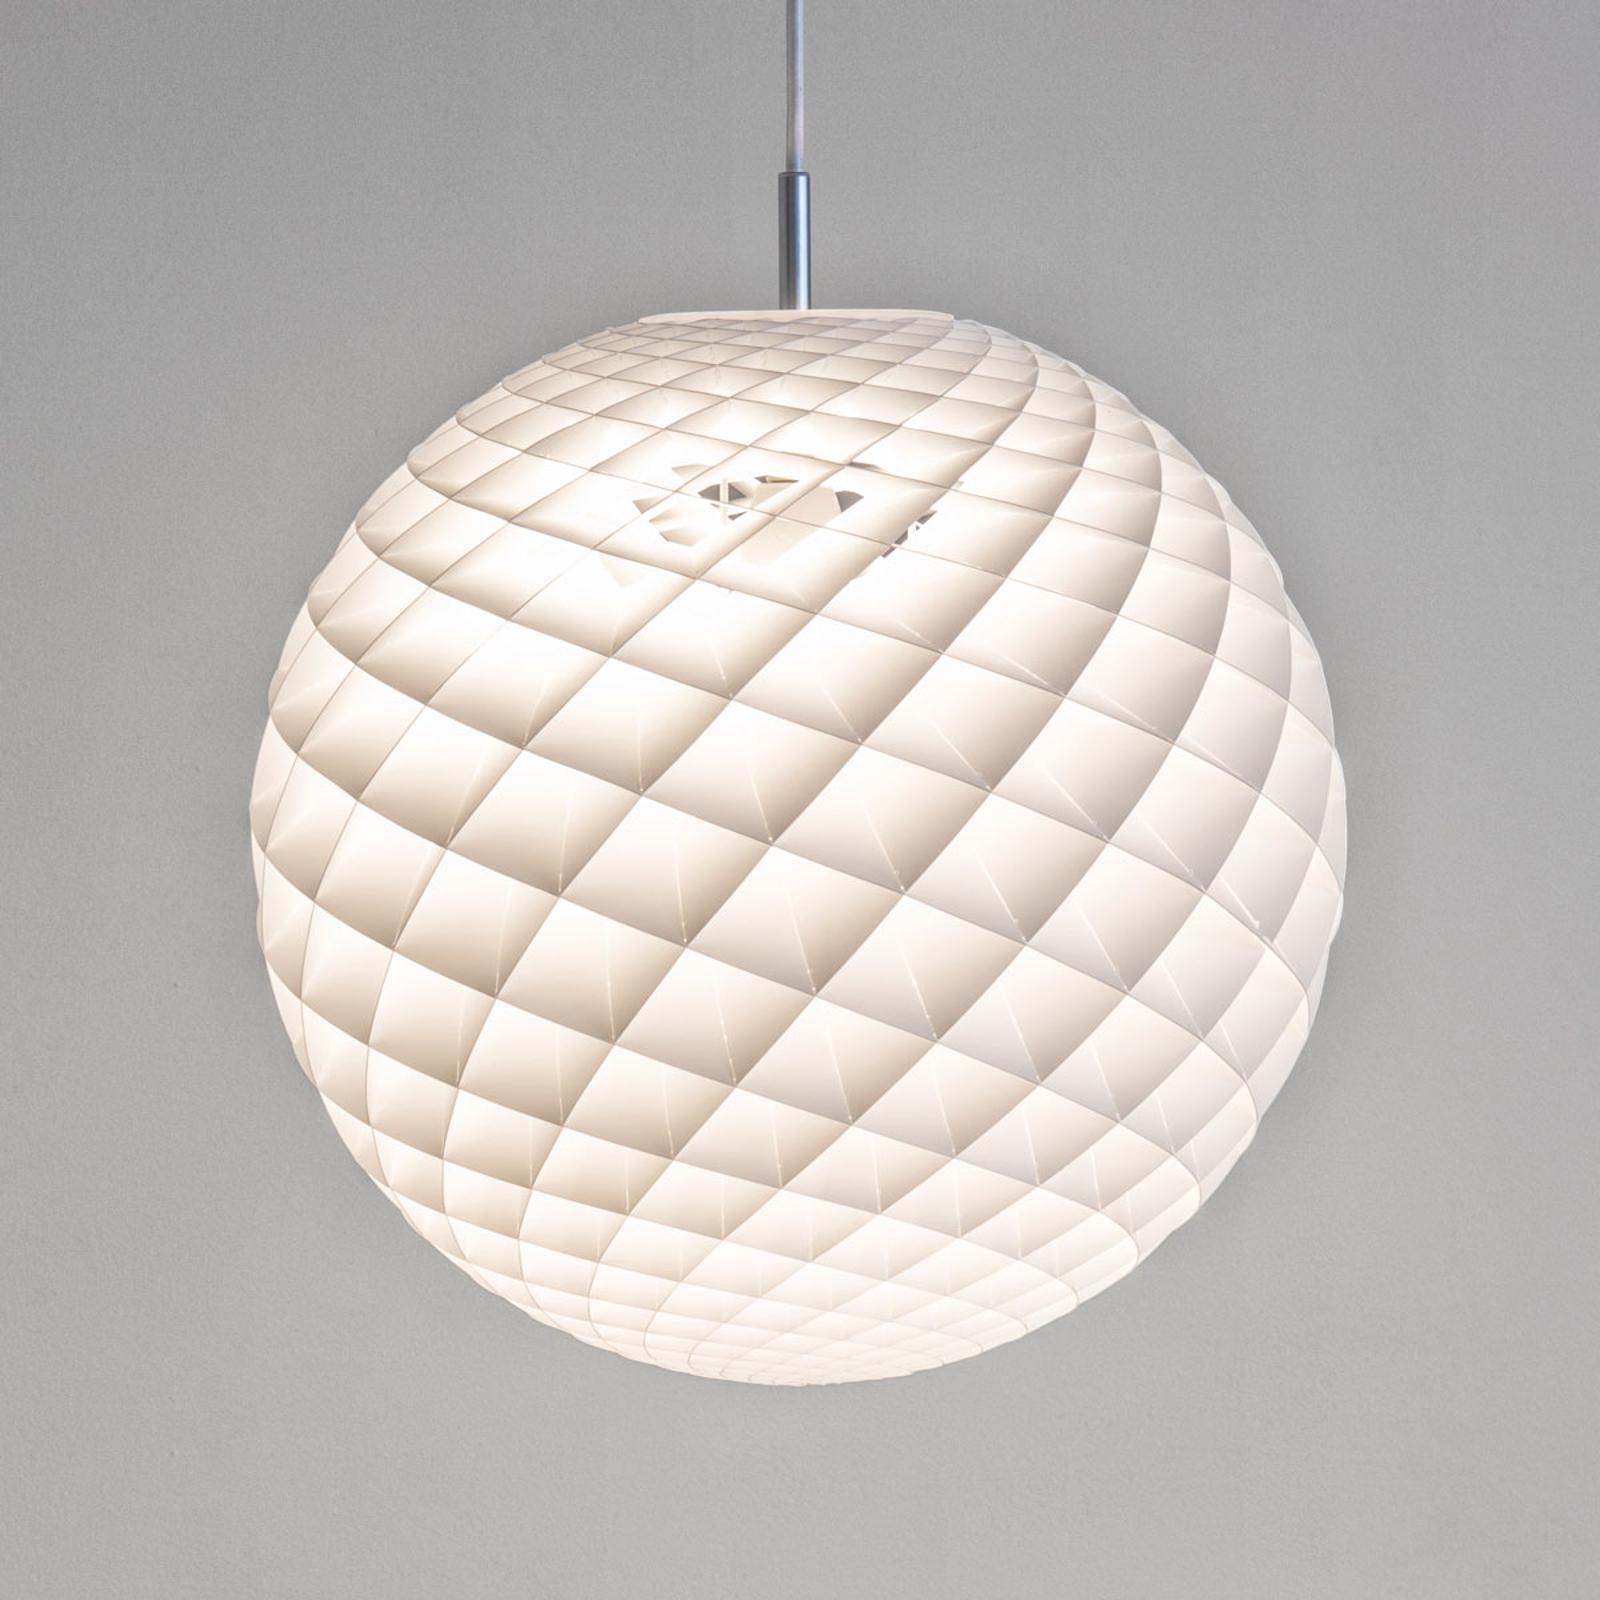 Louis Poulsen Patera Pendellampe weiß matt 90 cm